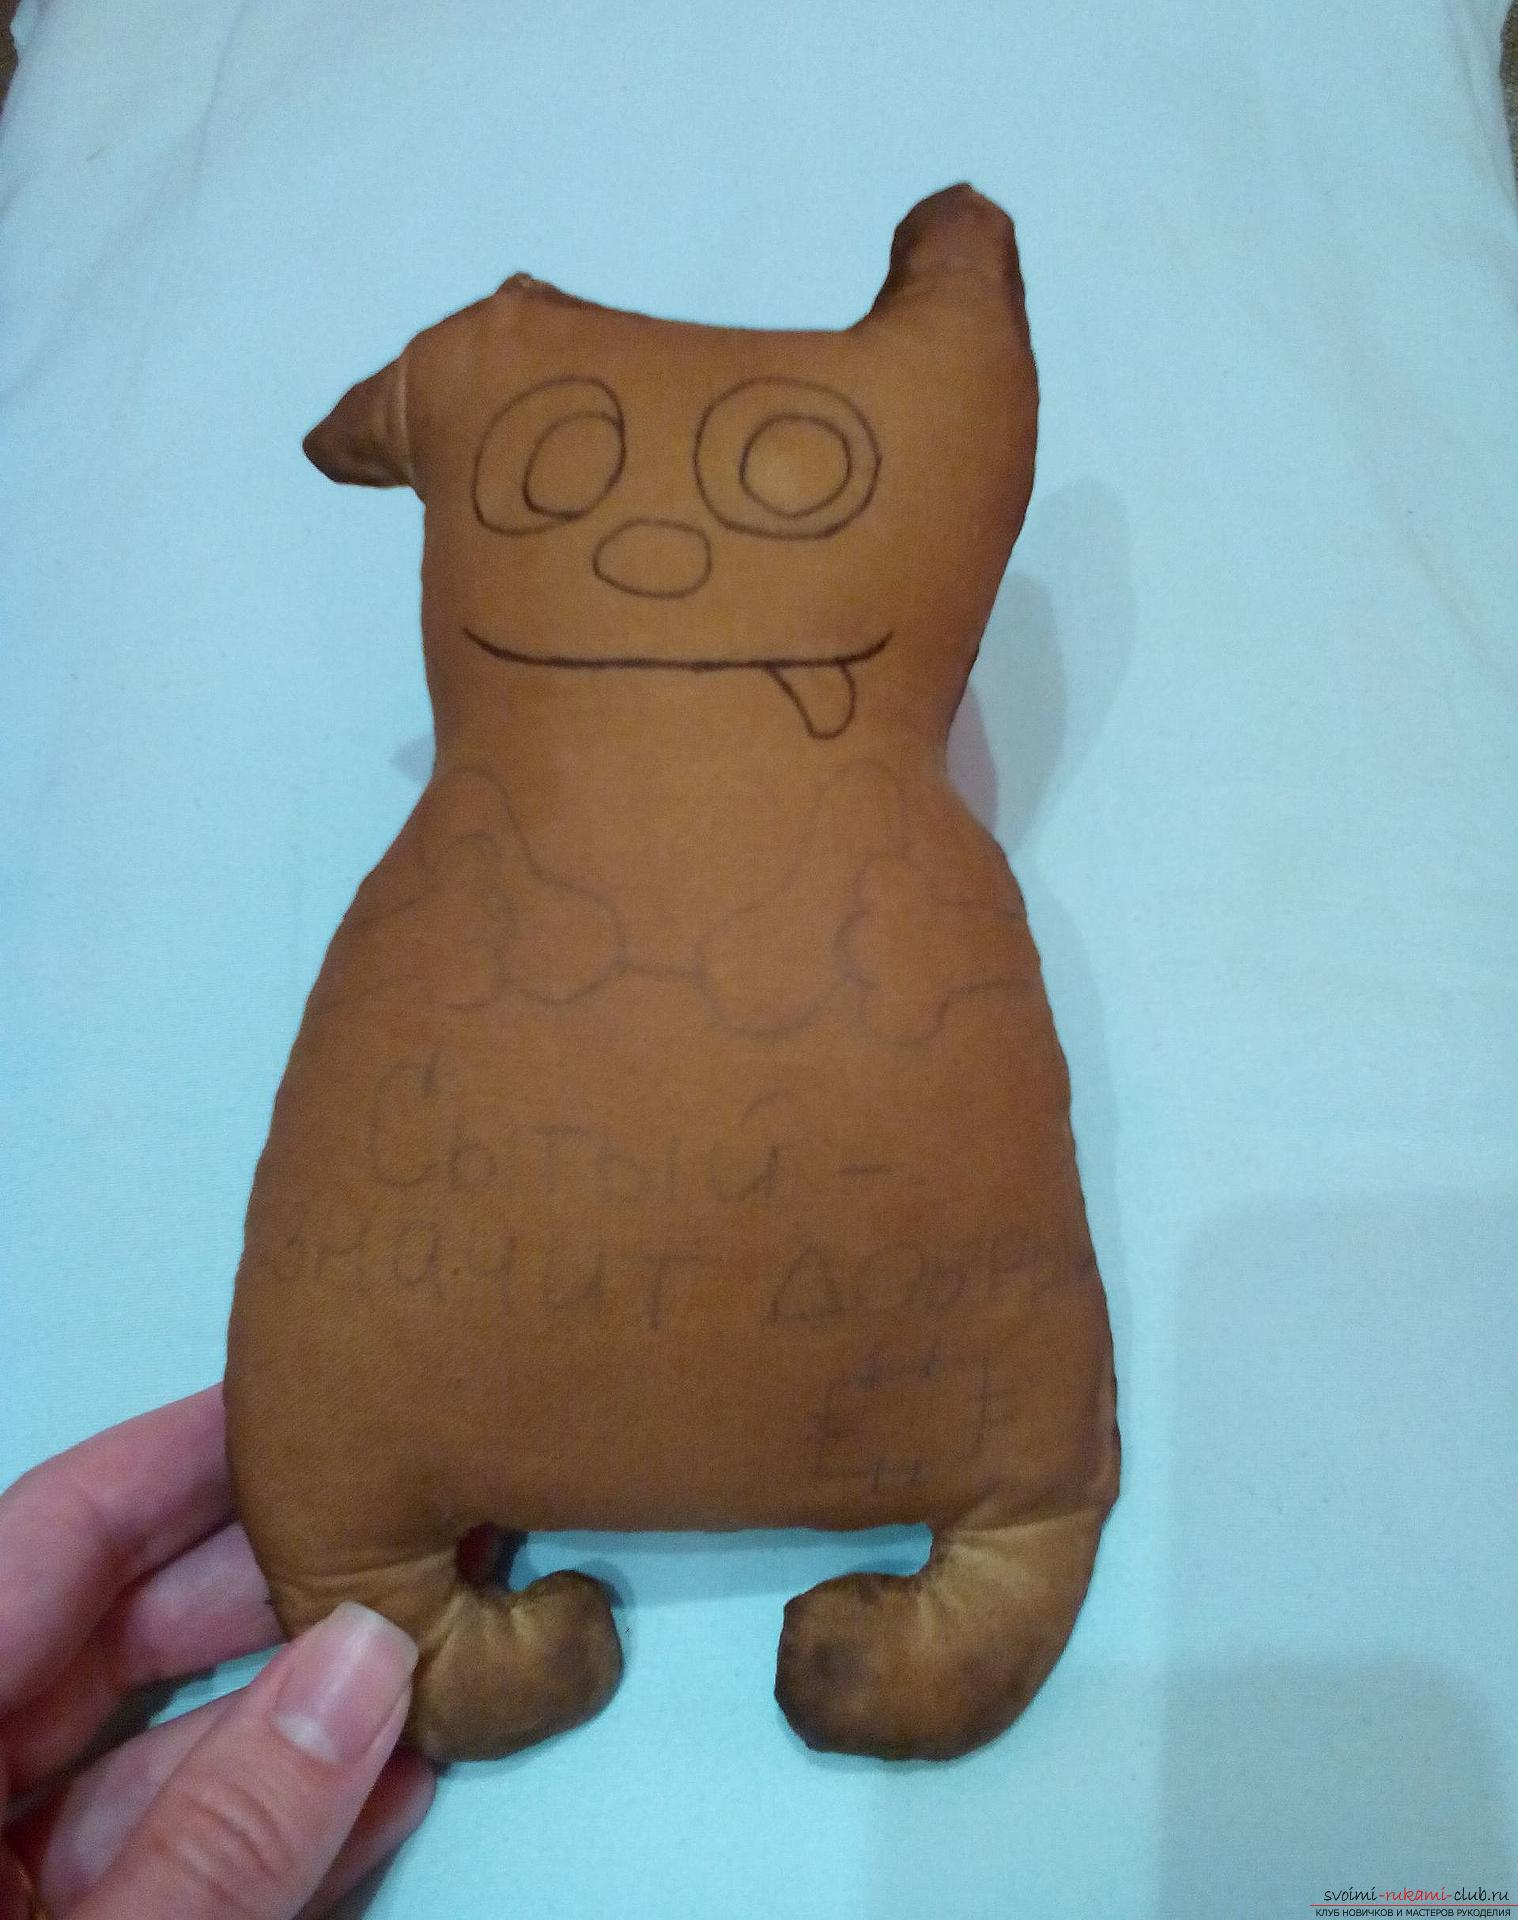 Этот мастер-класс содержит выкройку игрушки-примитива - мягкого кота Лакомки.. Фото №18